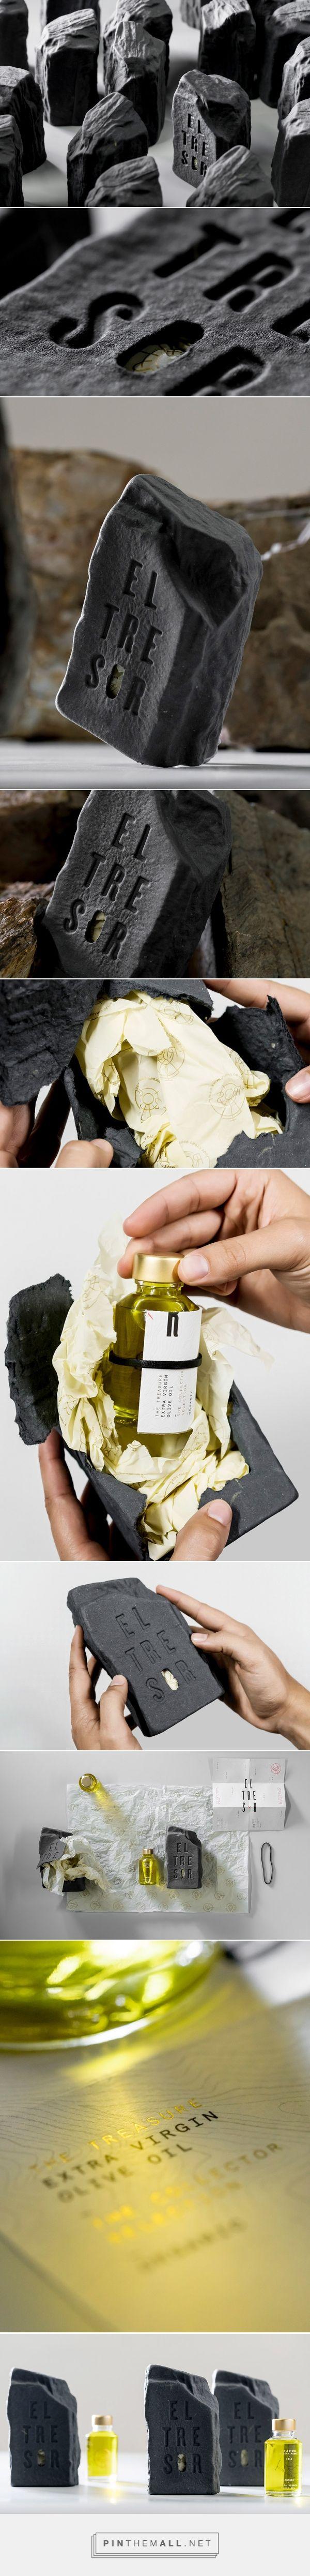 El tresor (The treasure) exclusive olive oil packaging design by Zoo Studio - https://www.packagingoftheworld.com/2018/02/el-tresor-treasure.html